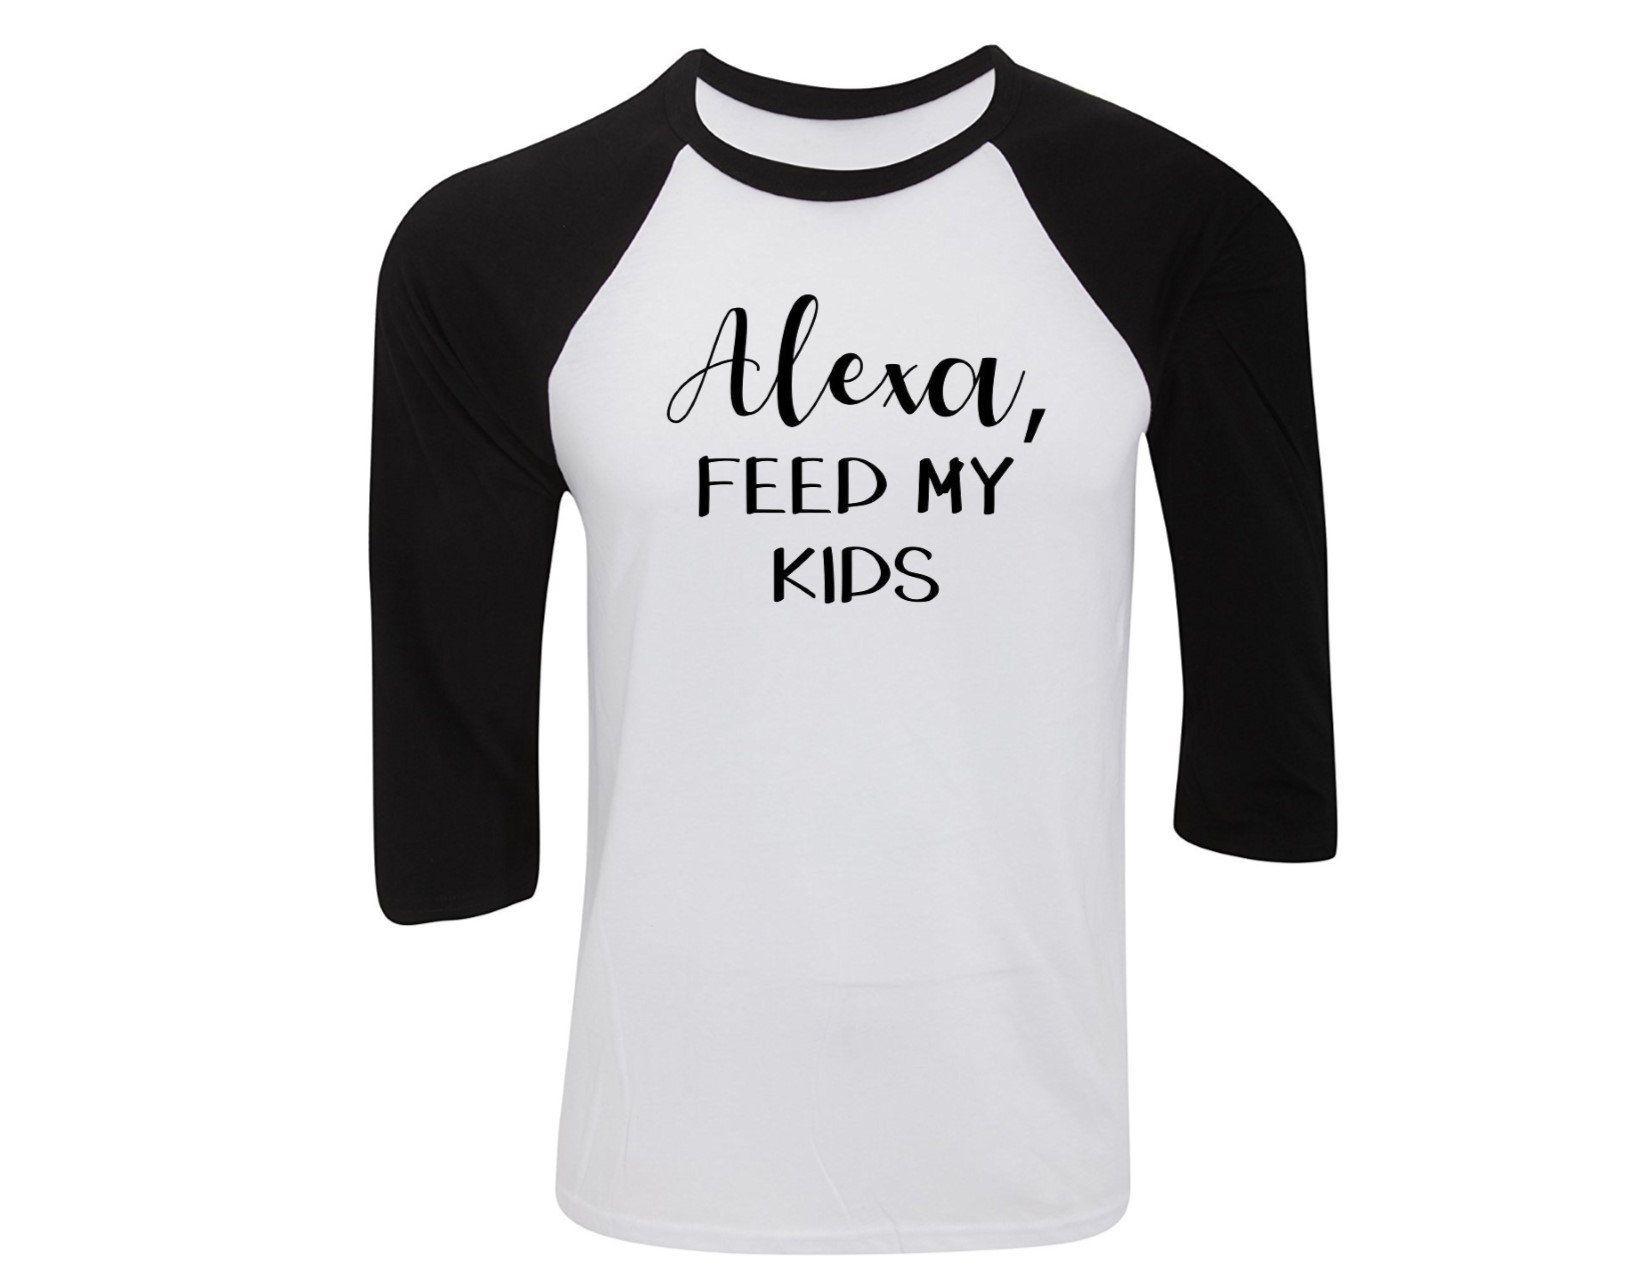 Alexa Feed My Kids Svg Amazon Amazon Echo Funny T Shirt